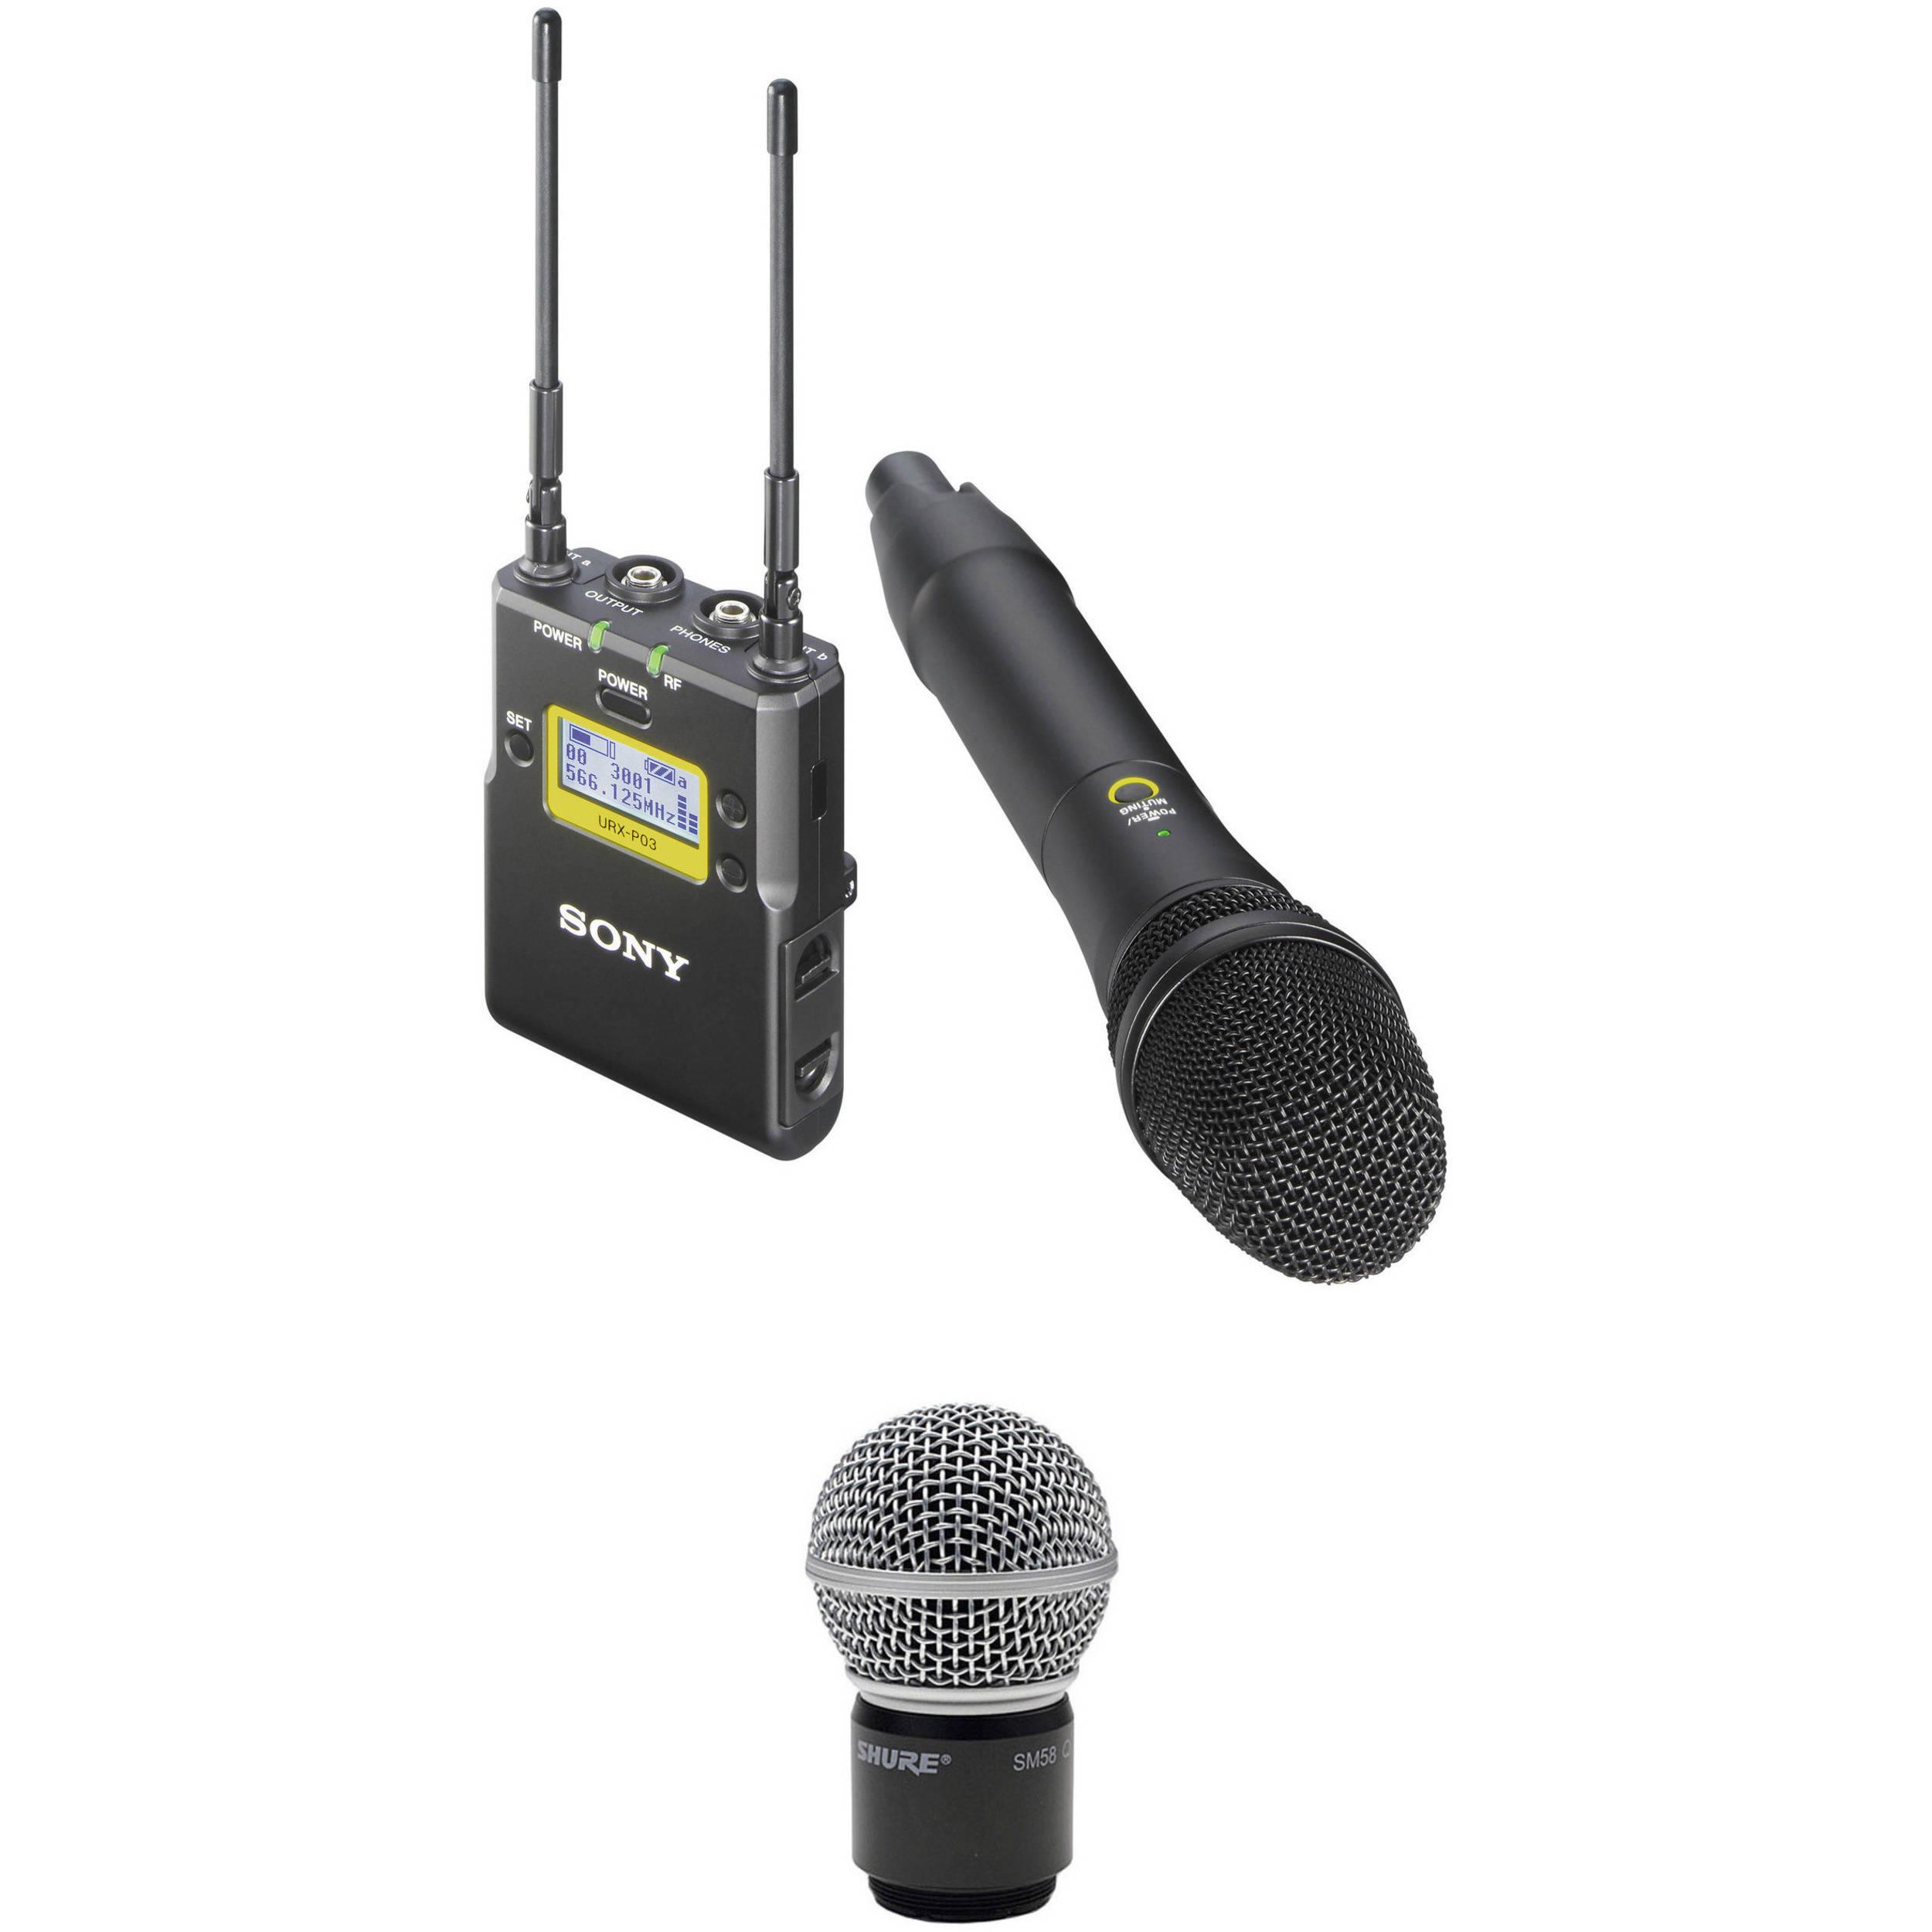 sony uwp d12 integrated digital wireless handheld microphone b h. Black Bedroom Furniture Sets. Home Design Ideas